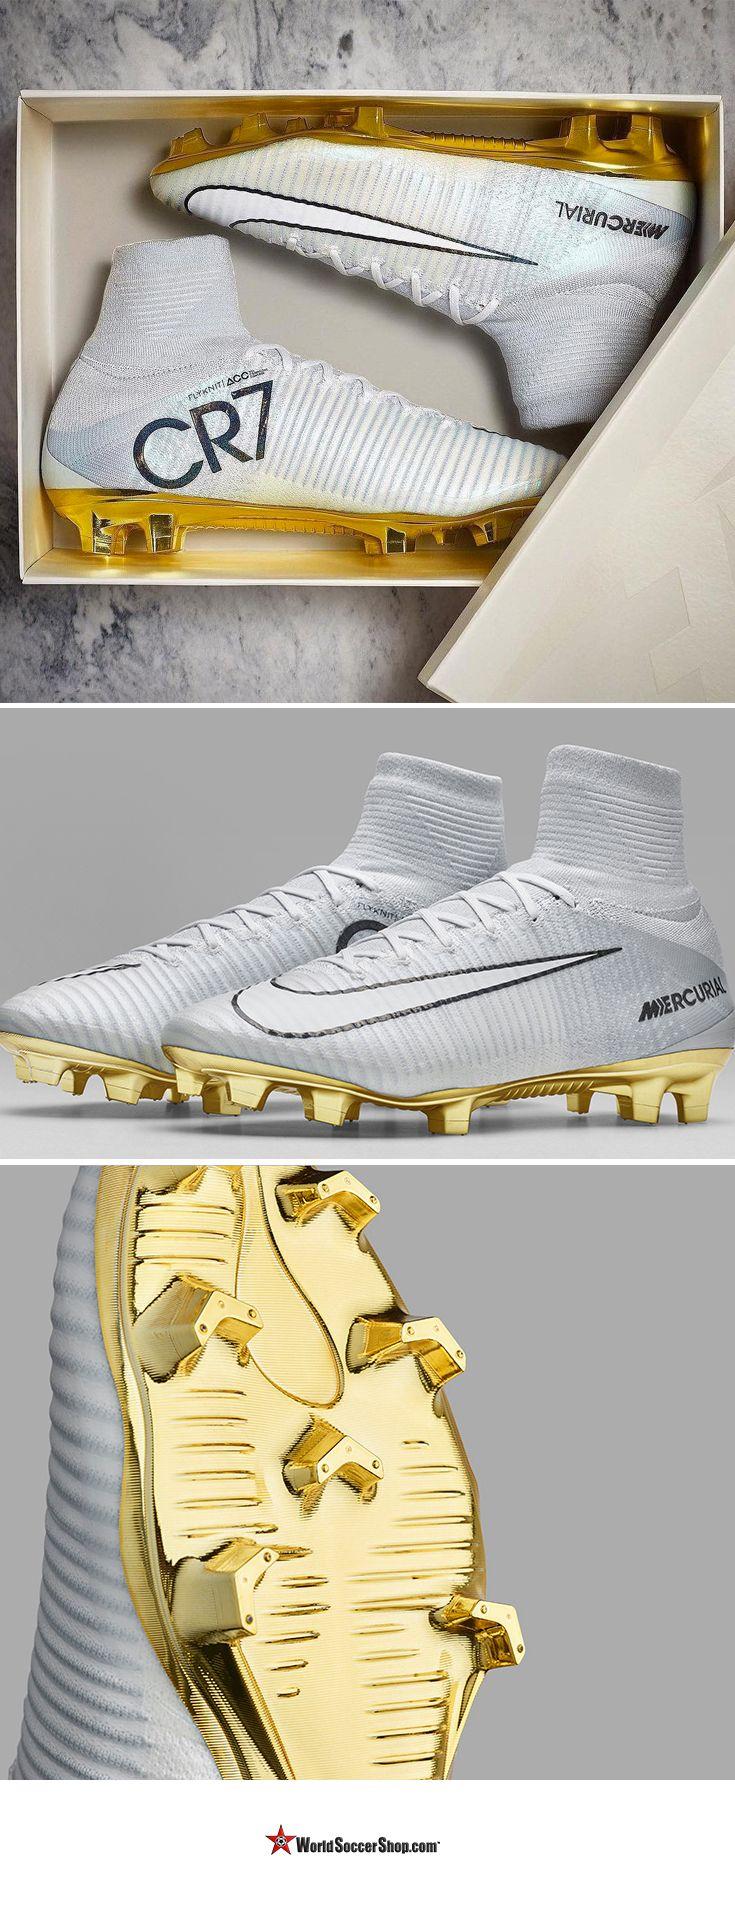 Las botas de Cristiano Ronaldo... Amazing!